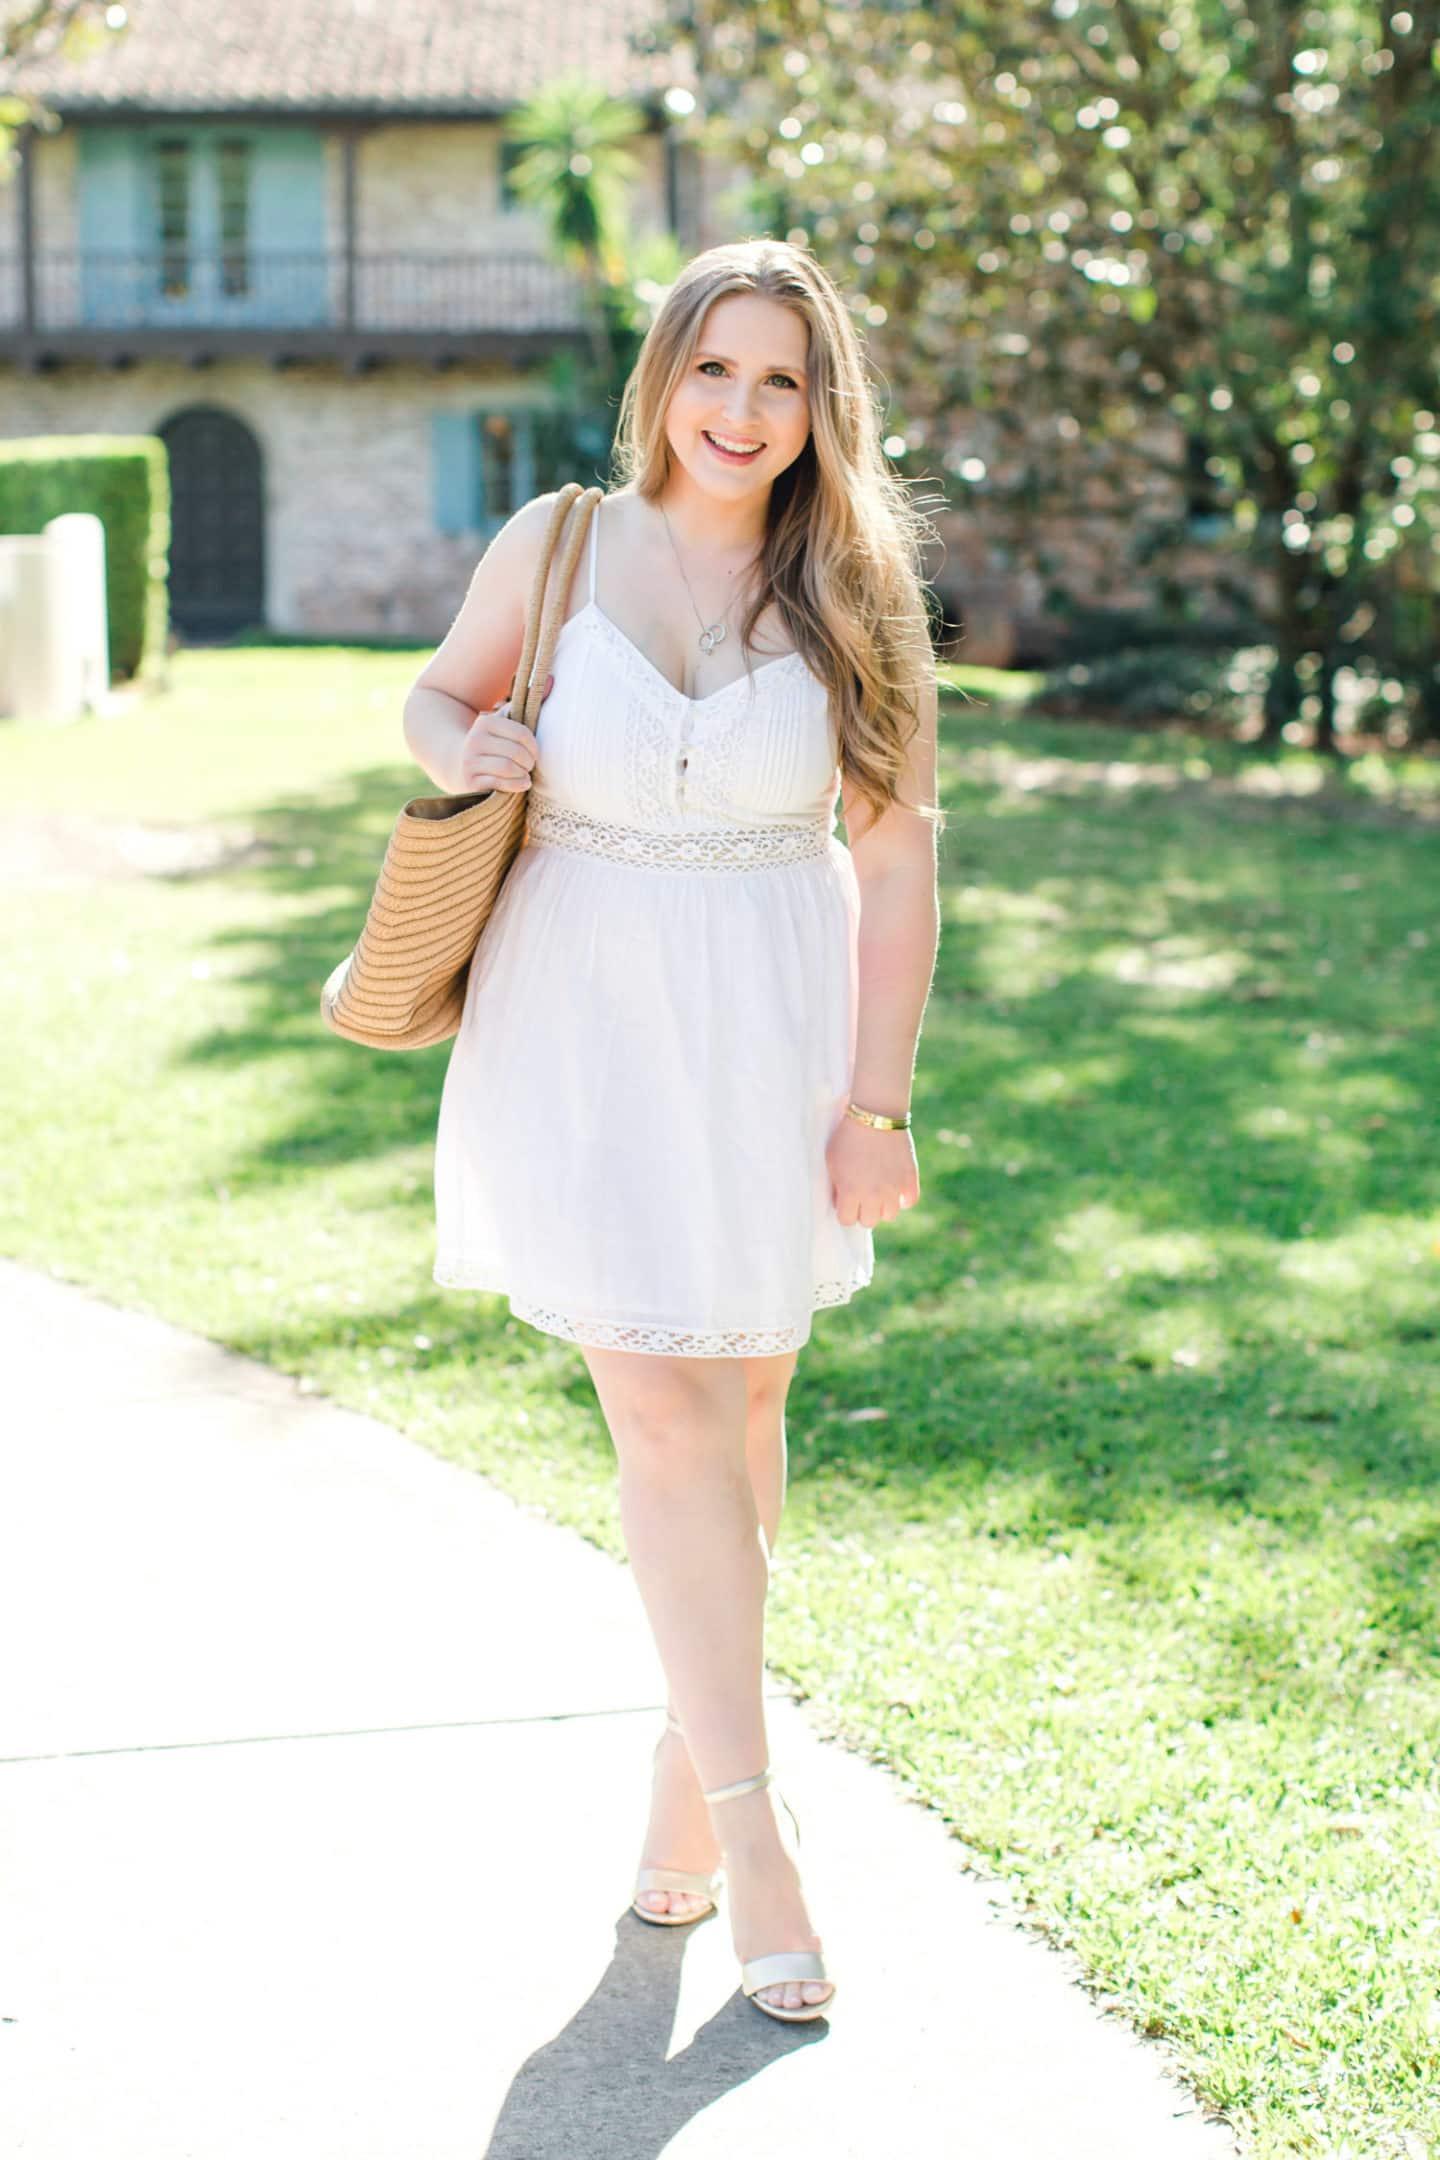 Vacation-Ready Red Floral Dress | Ashley Brooke Nicholas